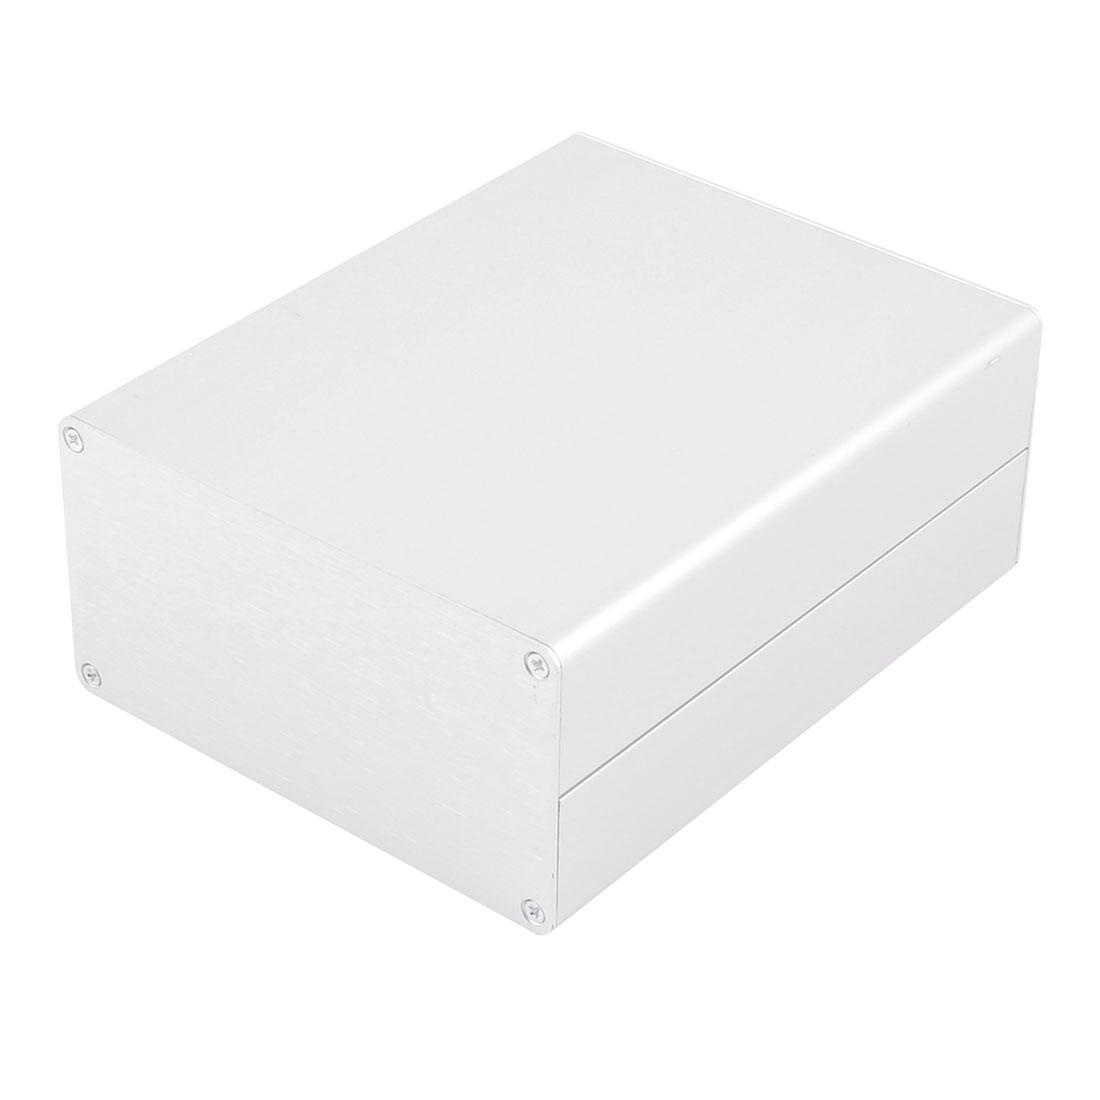 62.8 x 120 x 150mm Multi-purpose Electronic Extruded Aluminum Enclosure Silver Tone